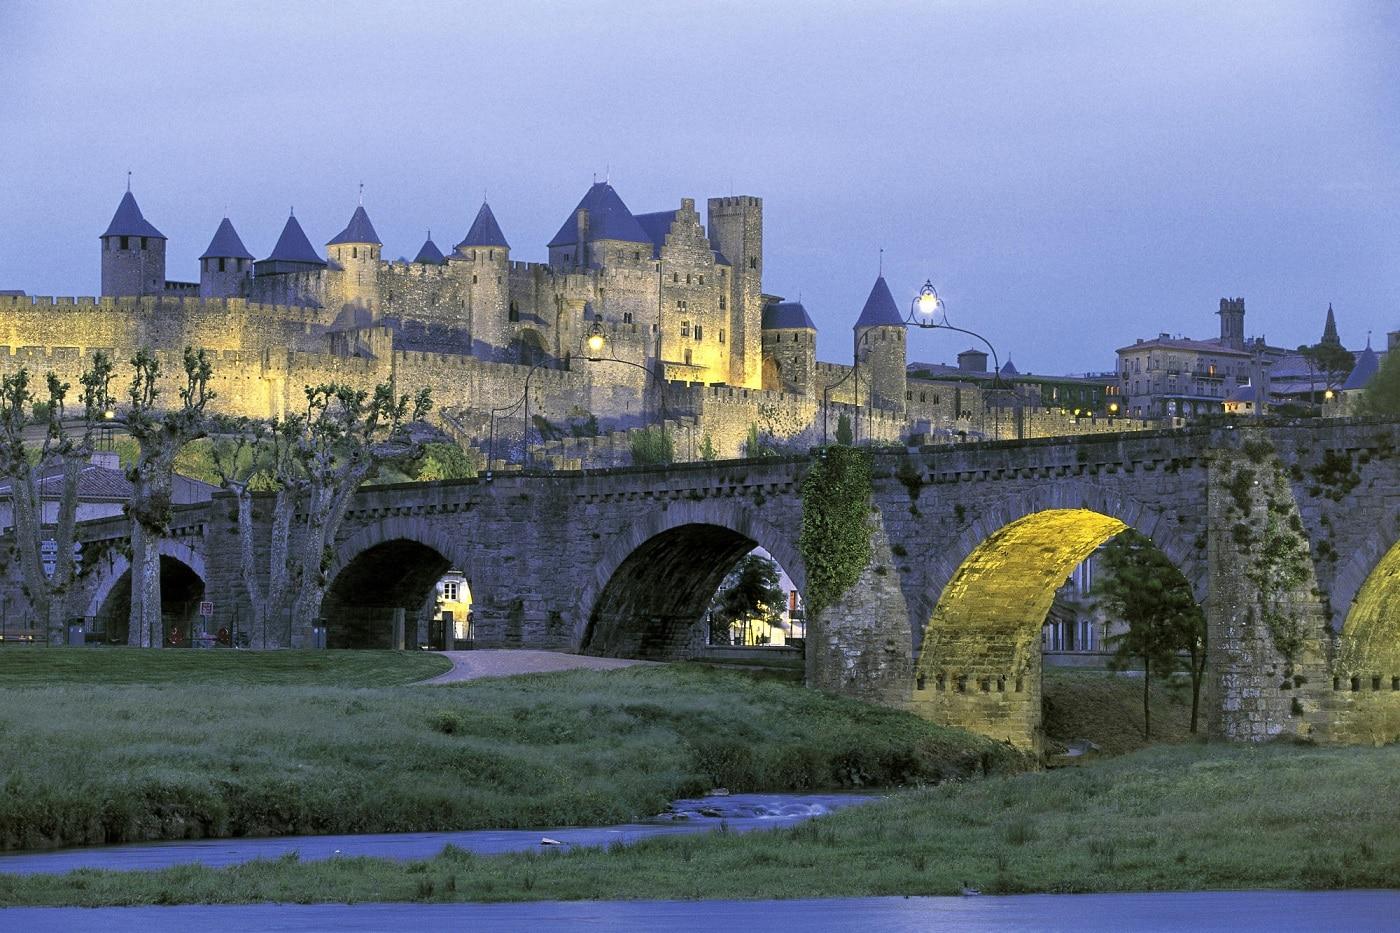 Castelul din Carcassonne